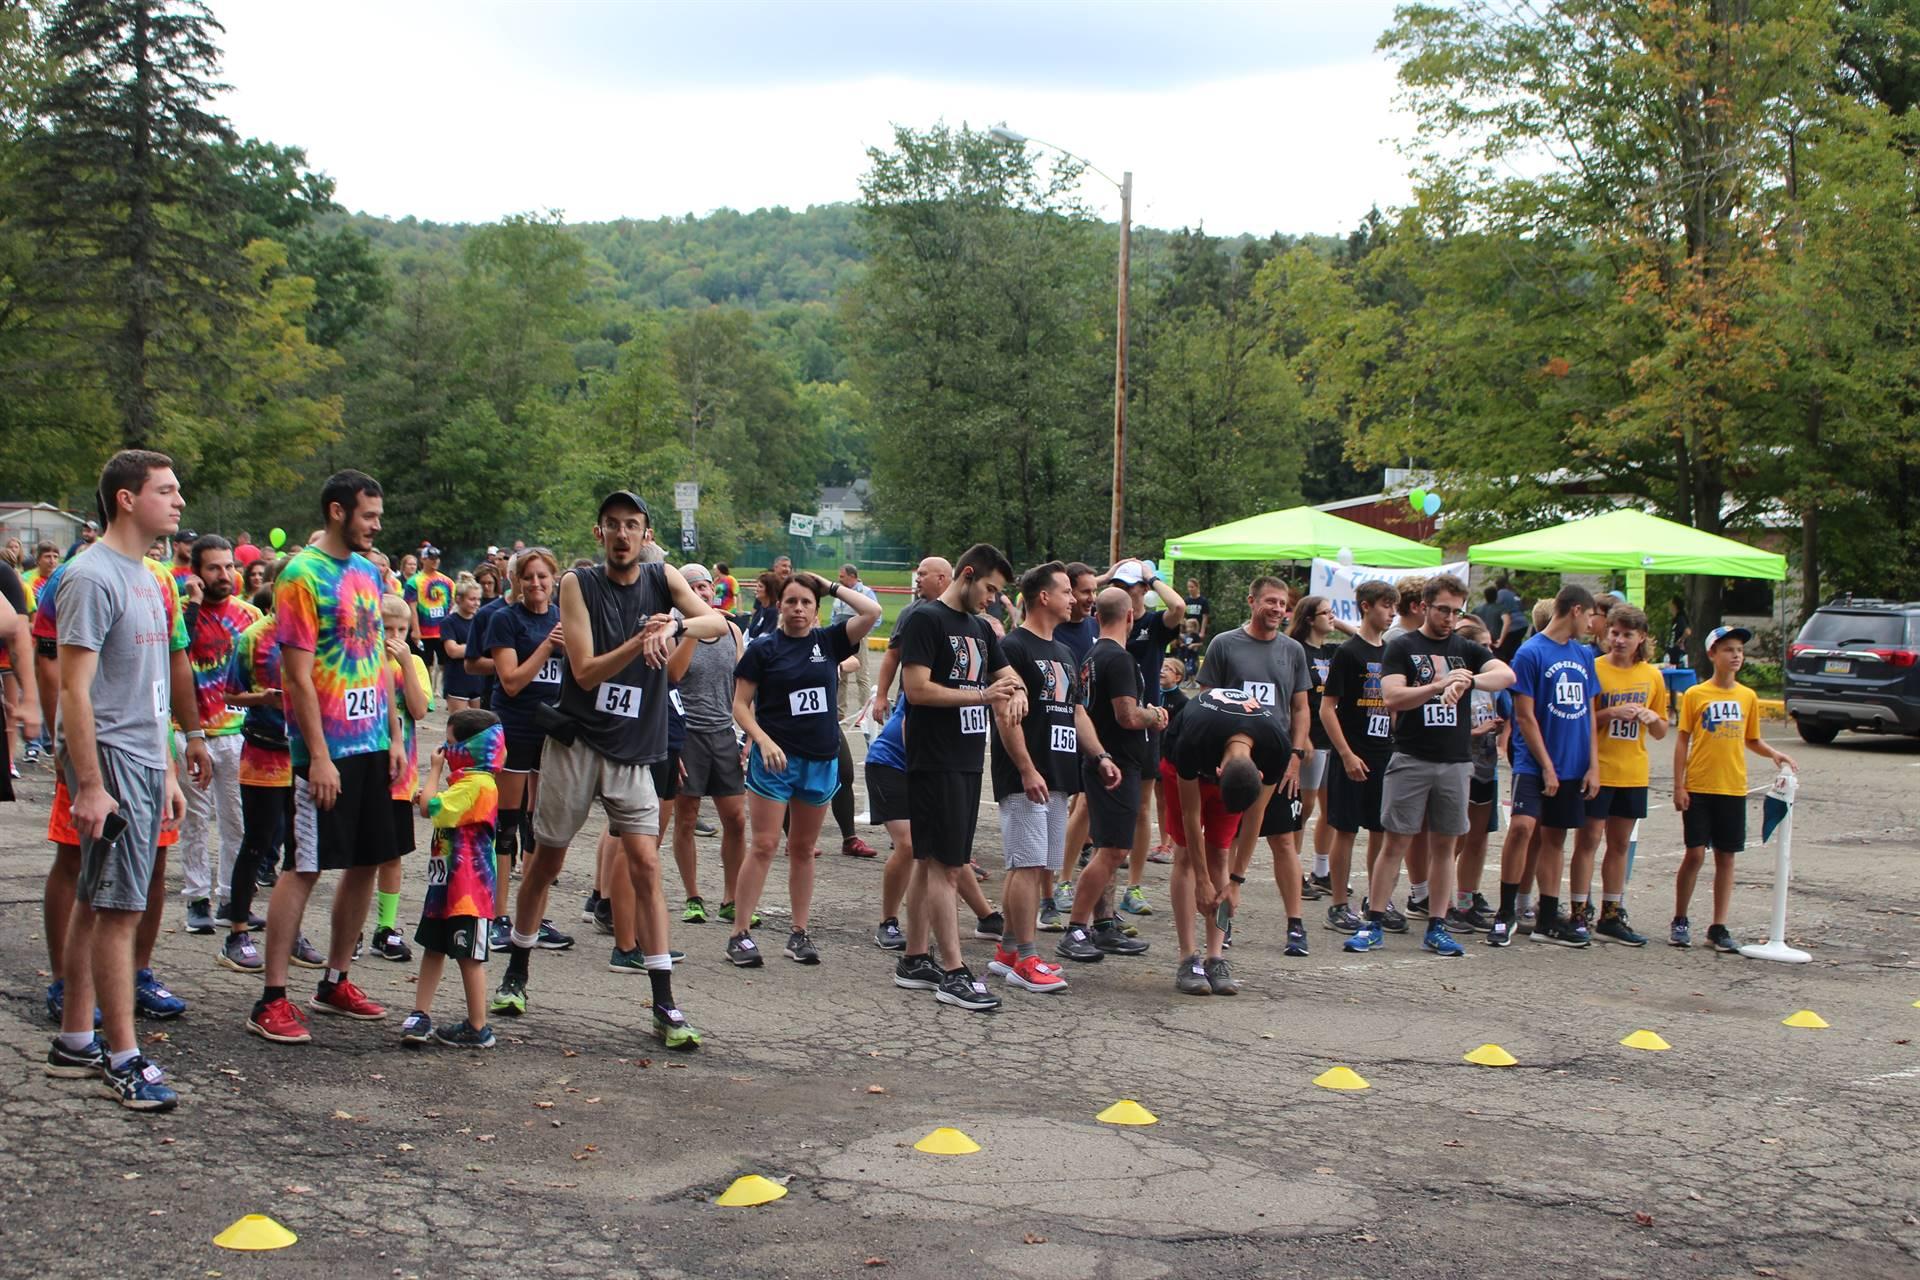 runners gathering at start of run